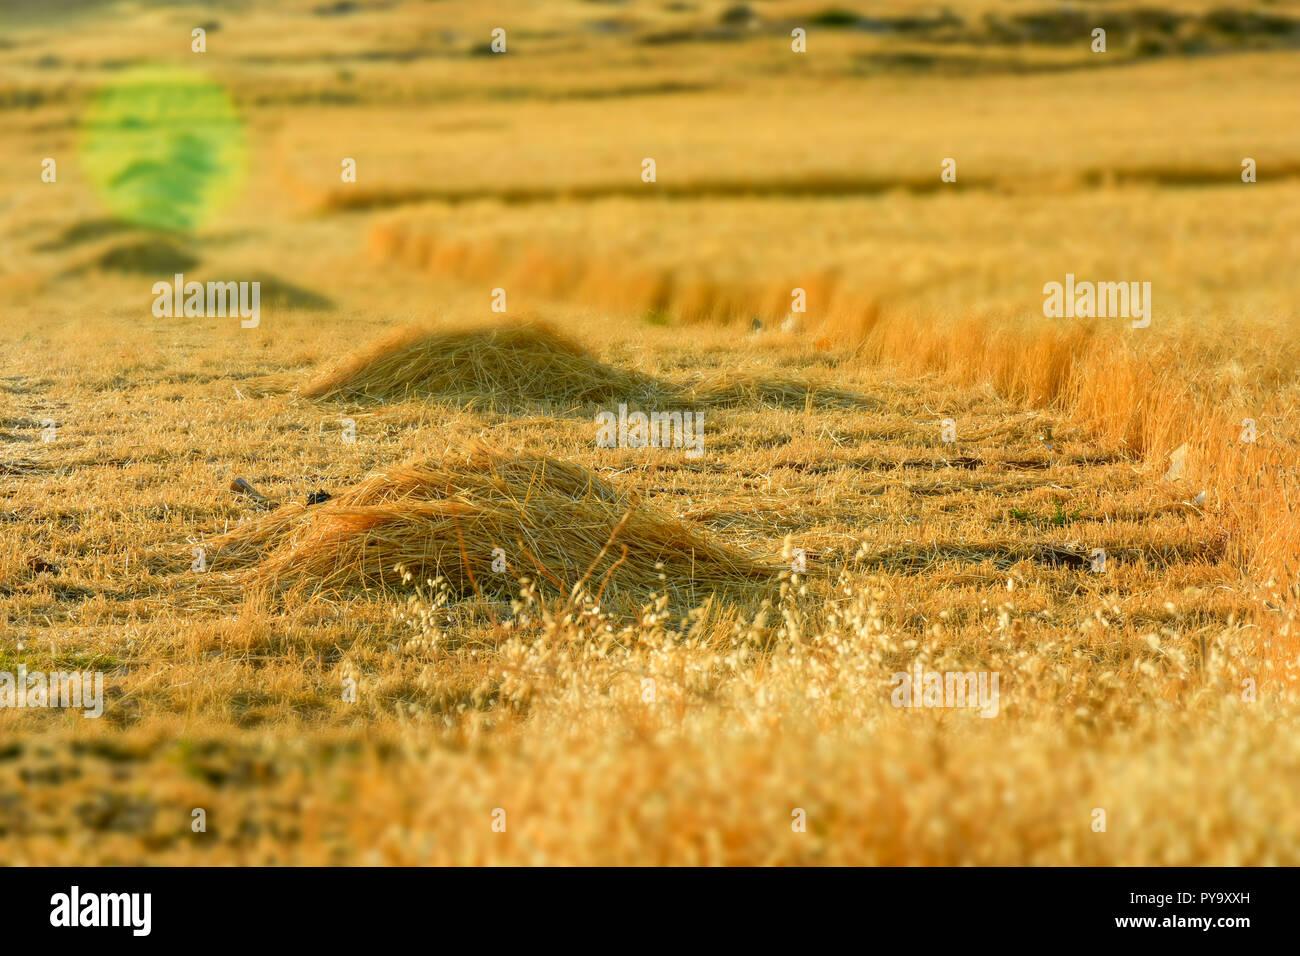 Barley field, Harvest season in summer Stock Photo